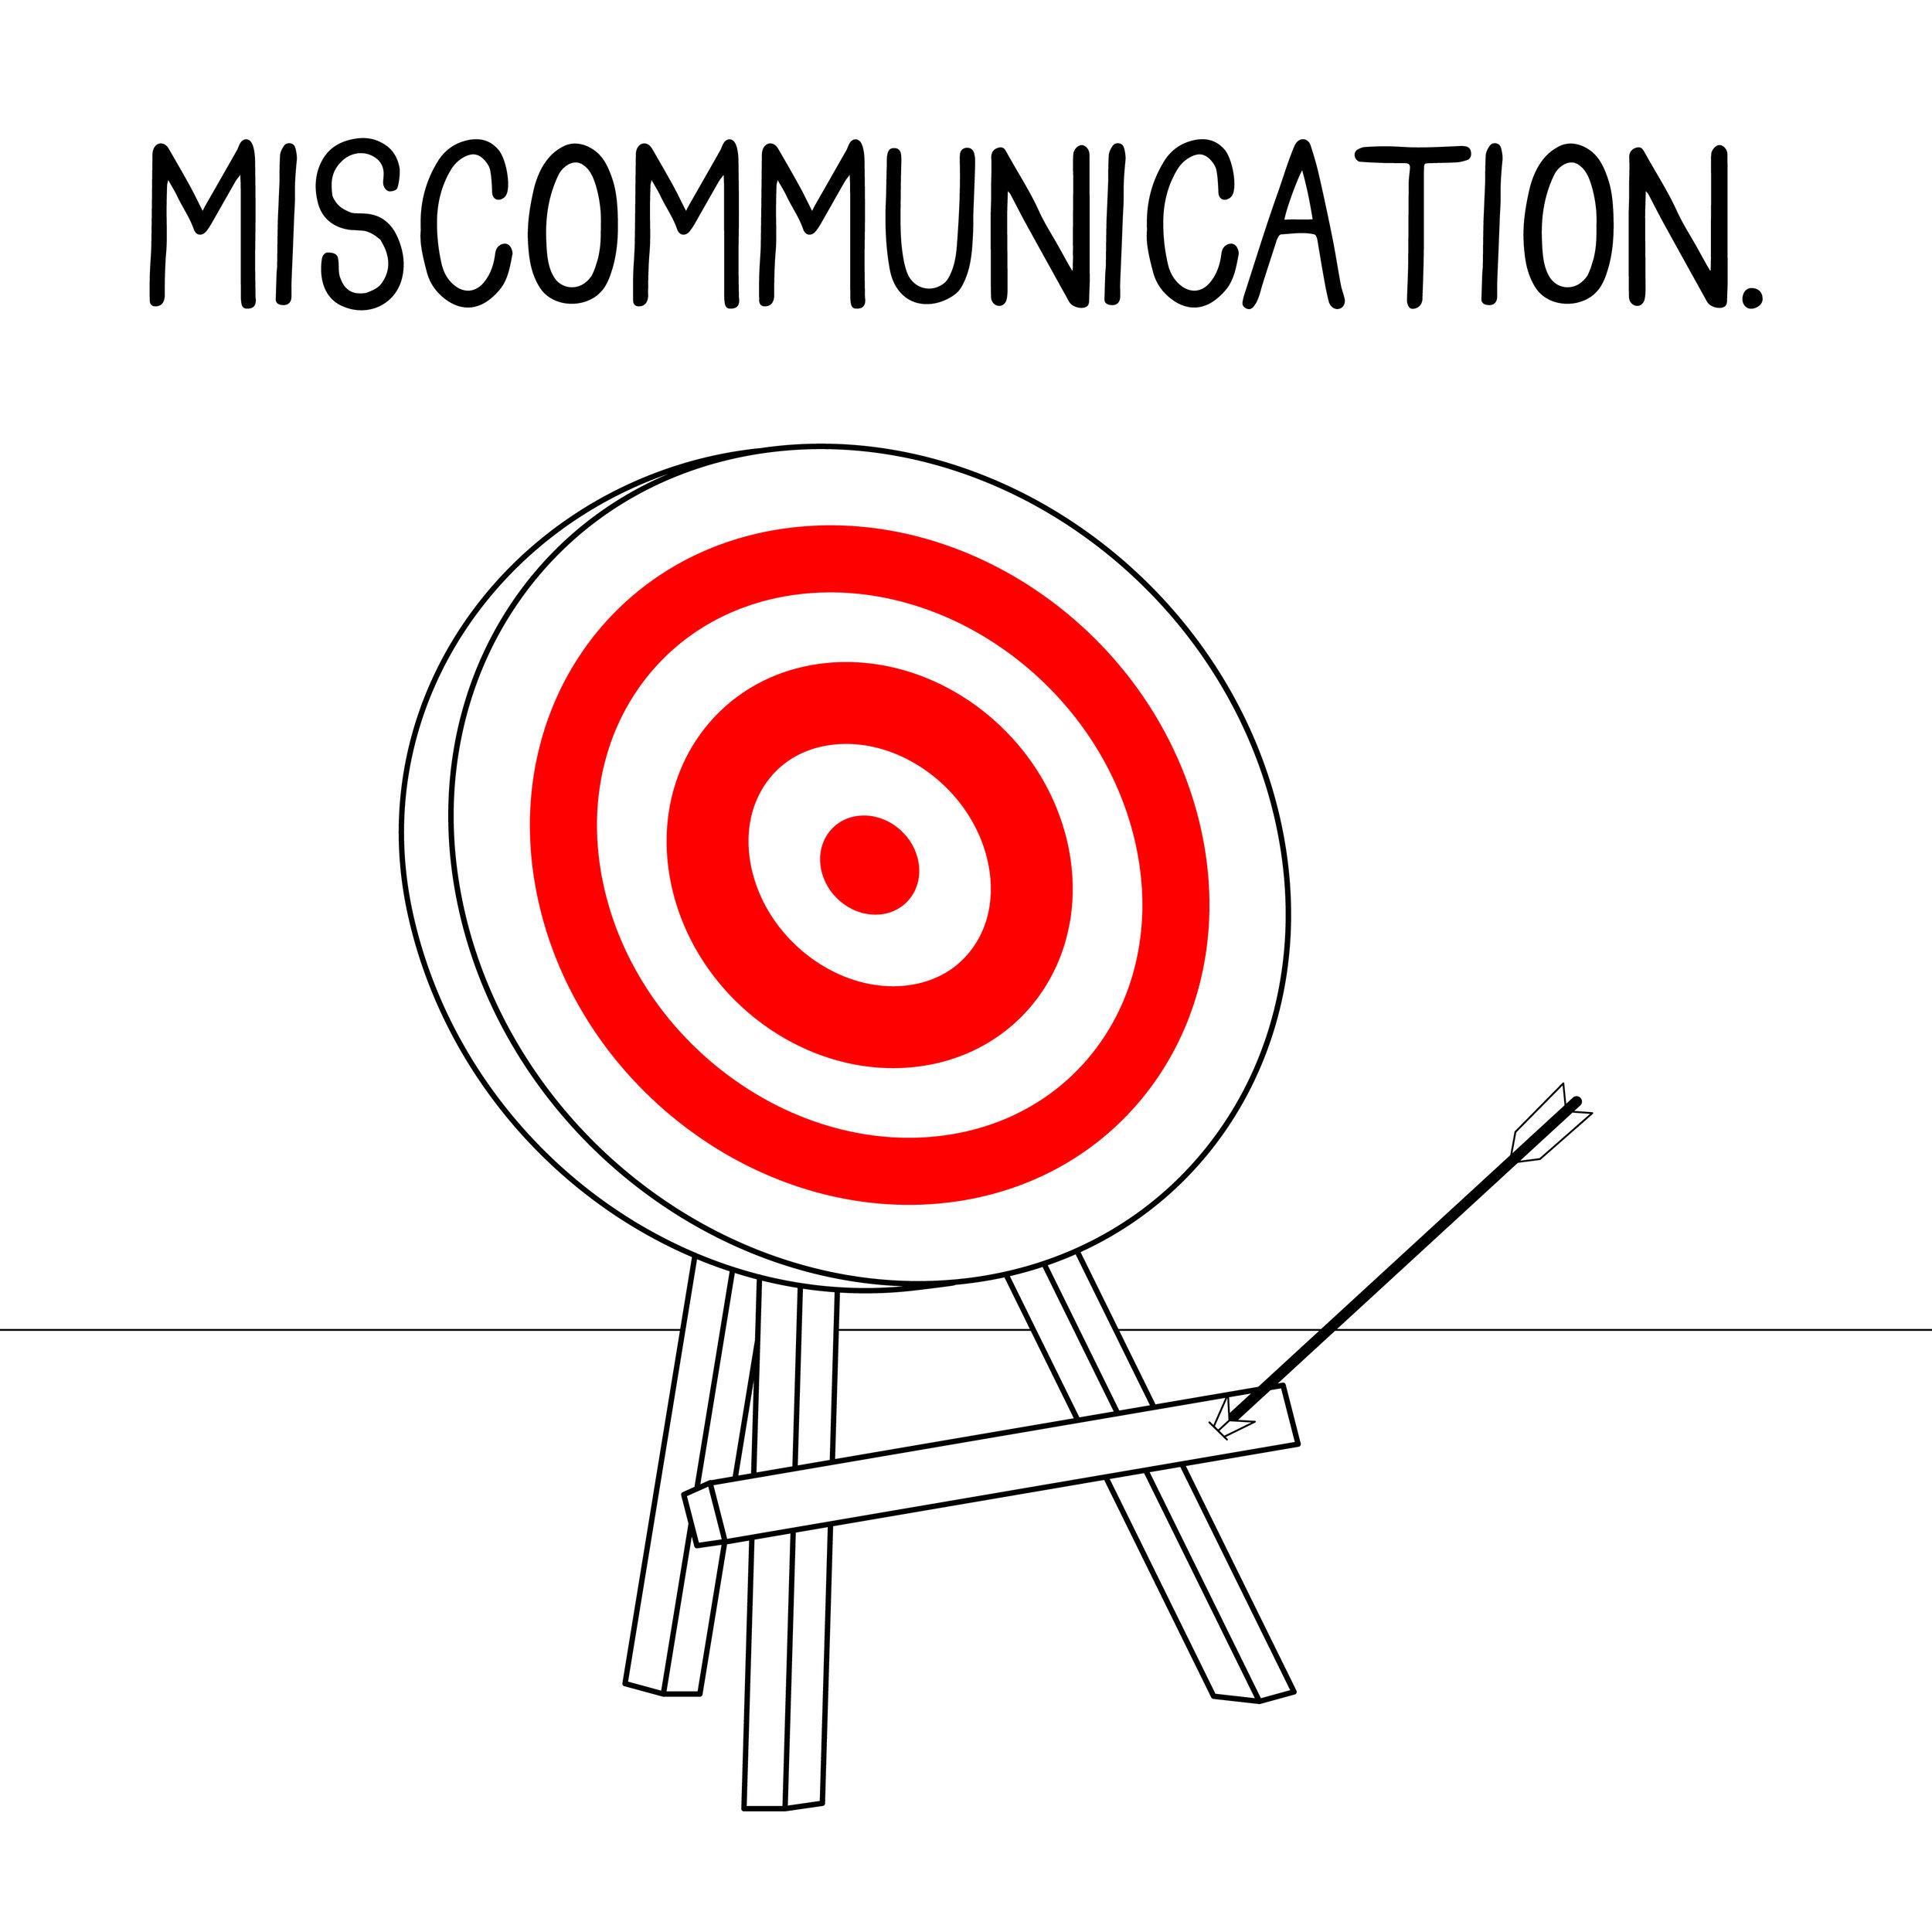 miscommunication-01.jpg